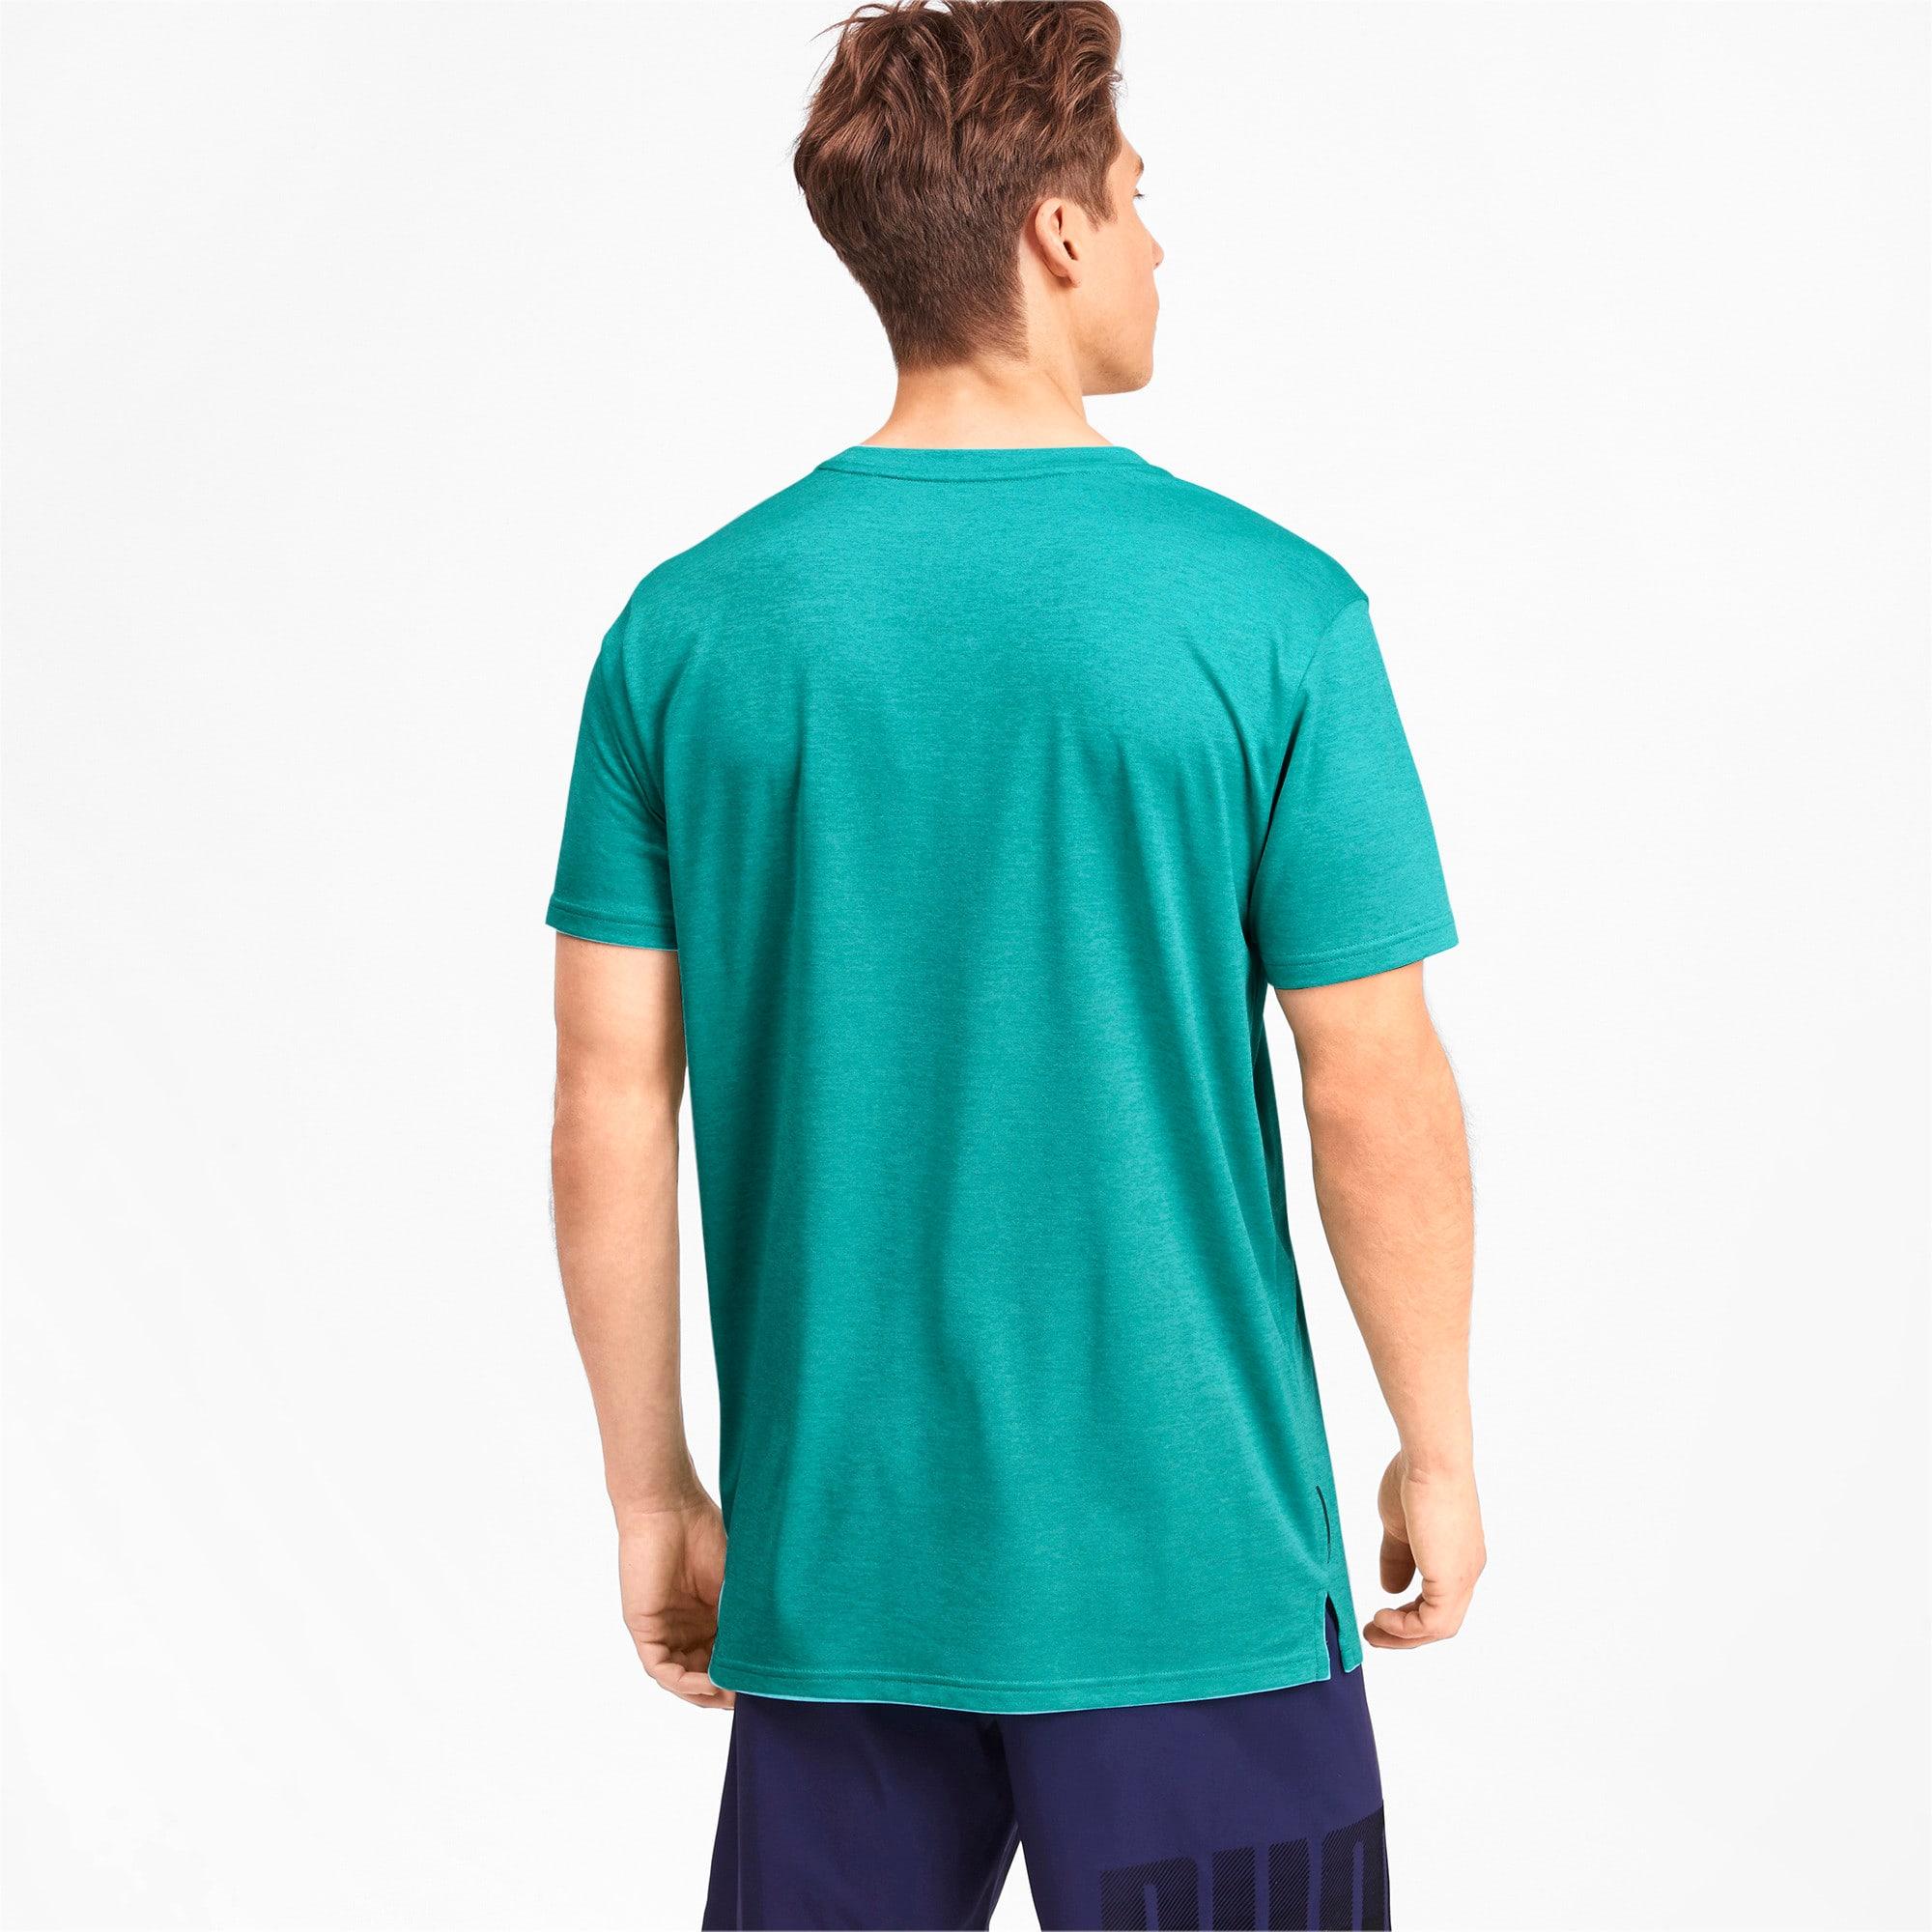 Thumbnail 2 of Heather Cat Herren Training T-Shirt, Blue Turquoise Heather, medium